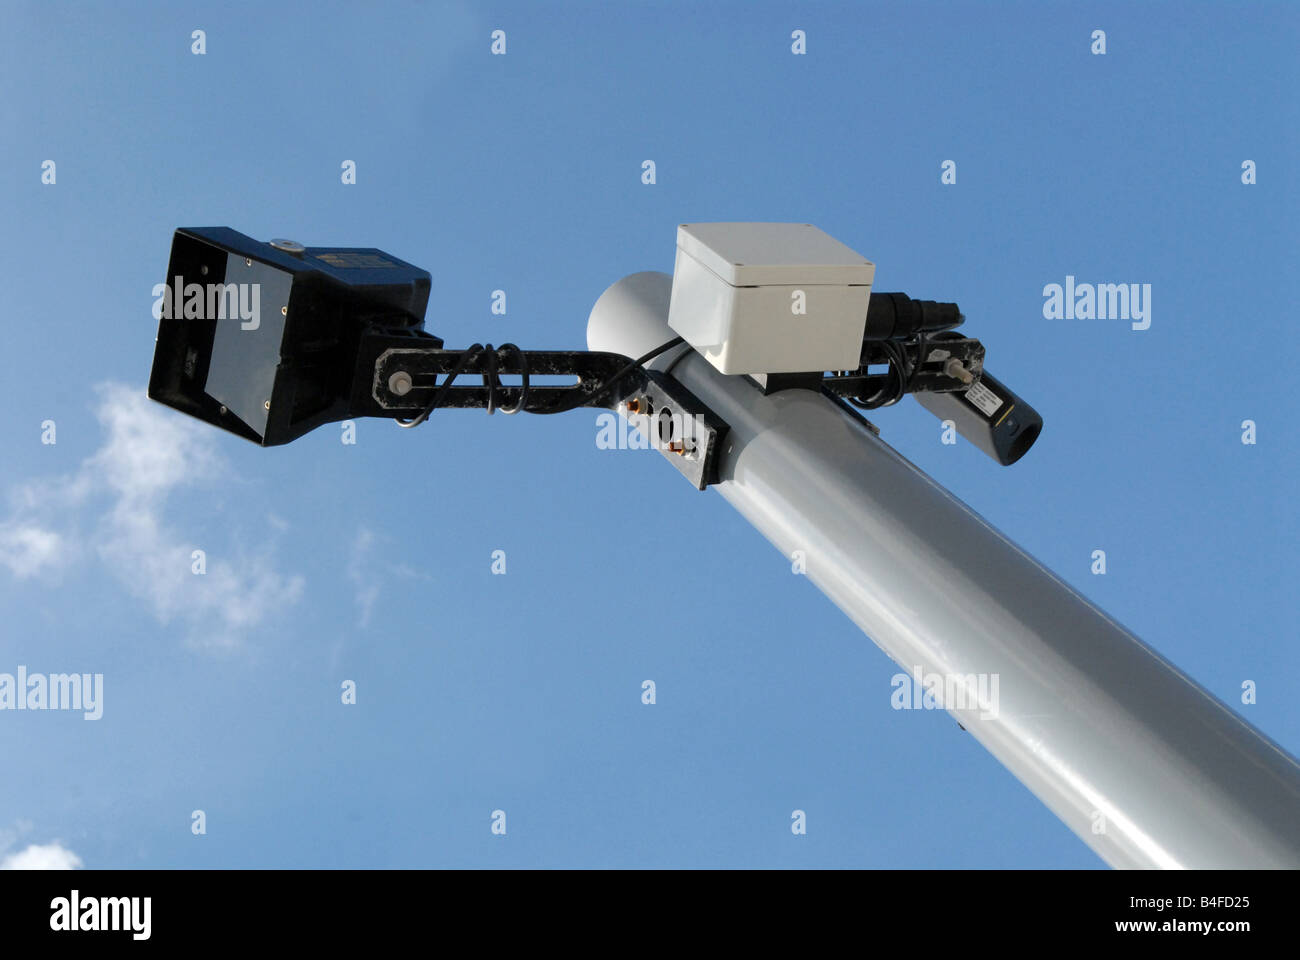 CCTV Closed Circuit Television, Surveillance - Stock Image